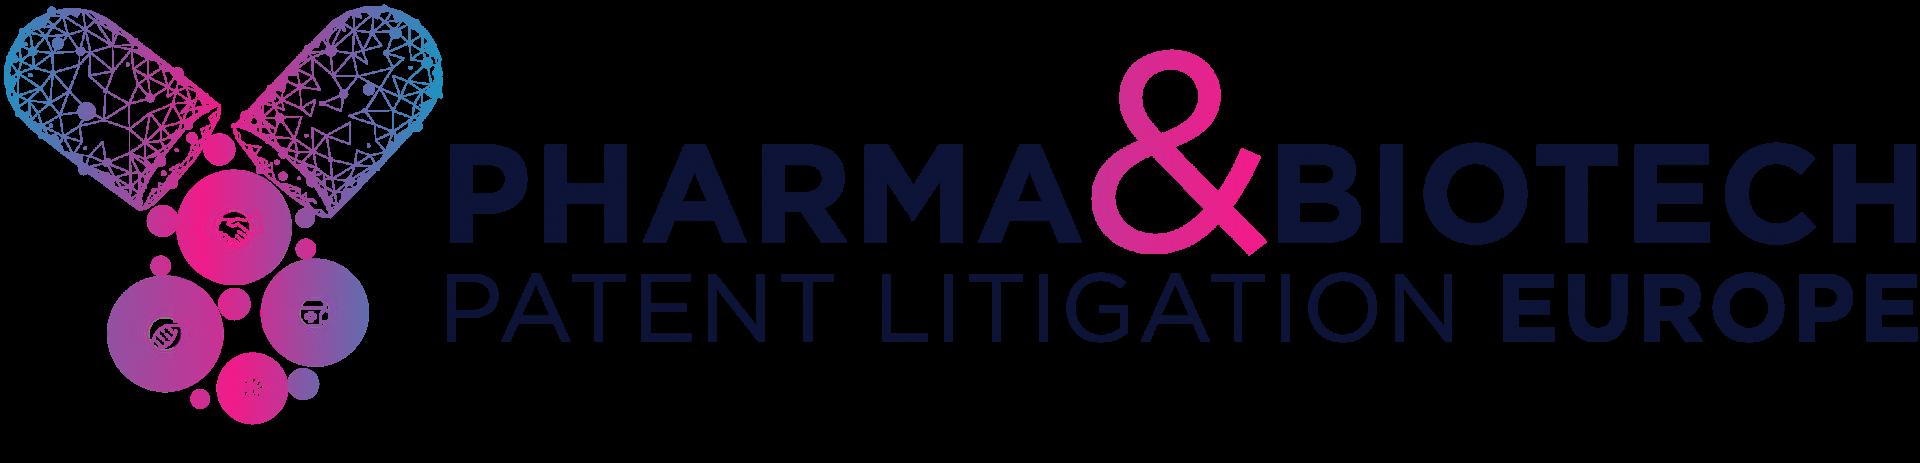 European Summit on Pharma and Biotech Patent Litigation